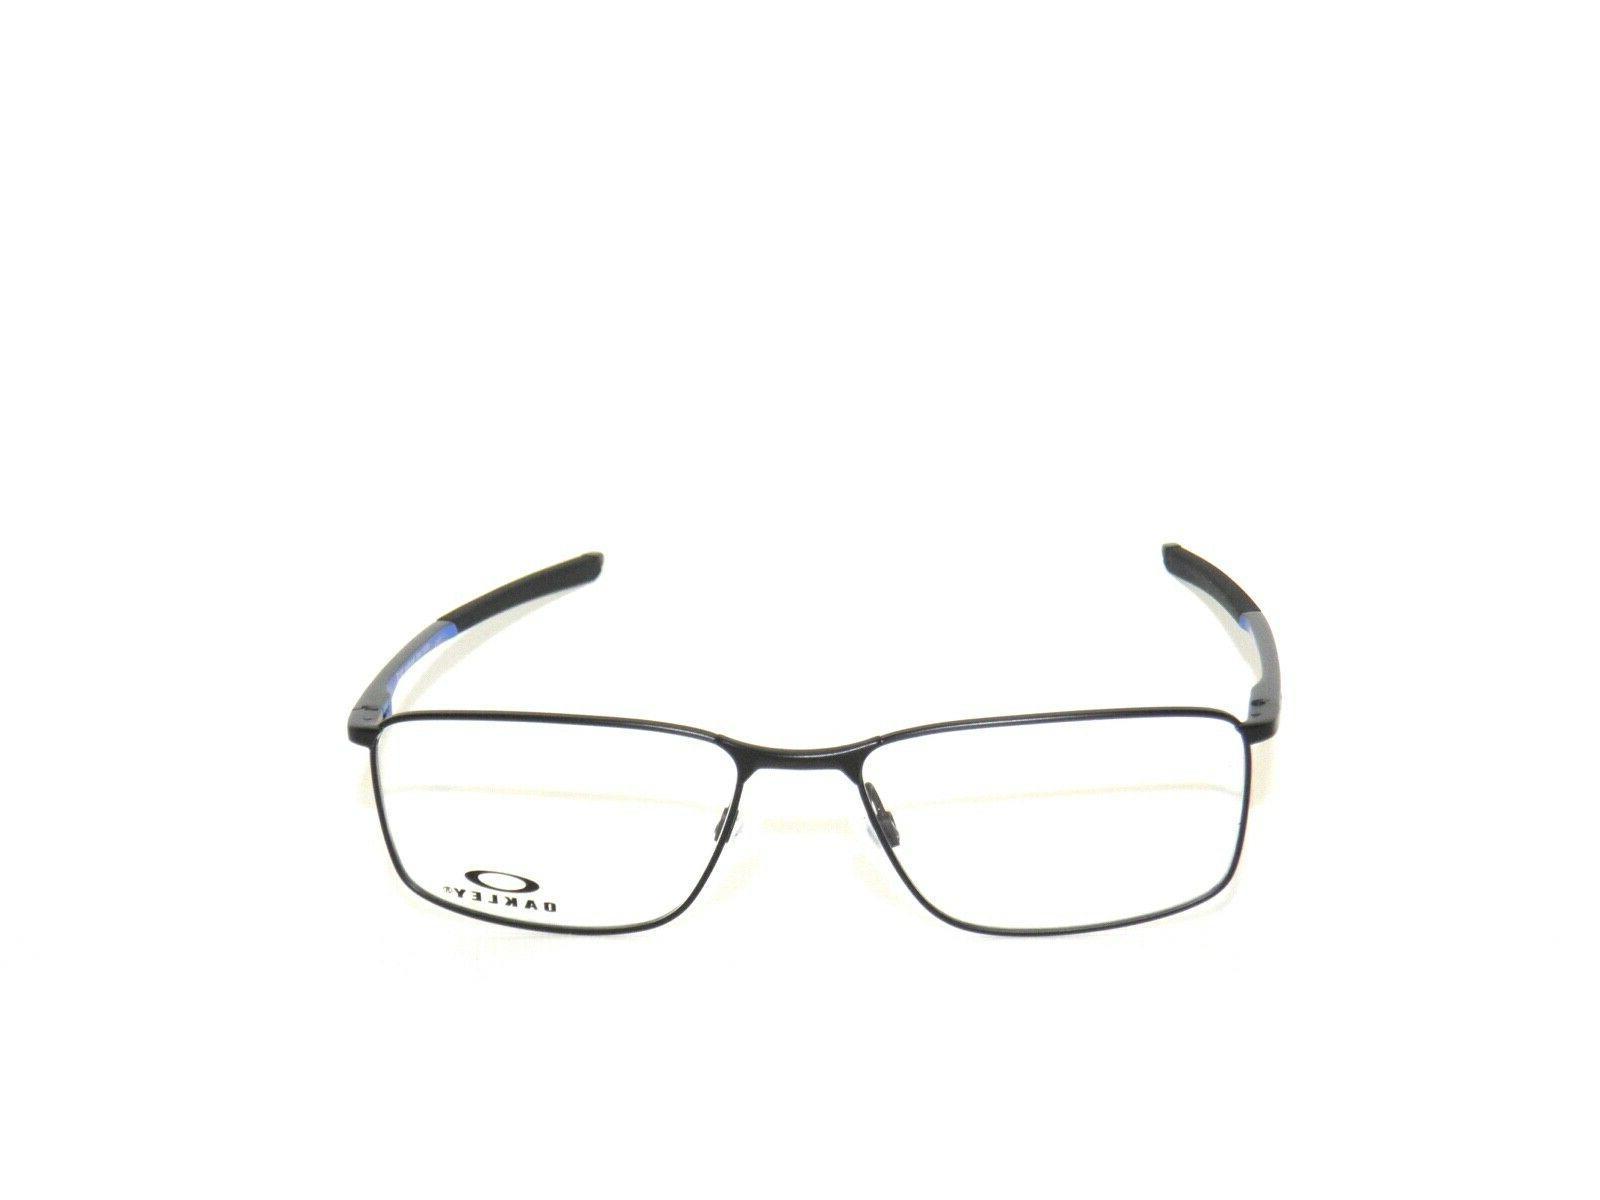 Oakley 3217-04 55 Black Eyeglasses